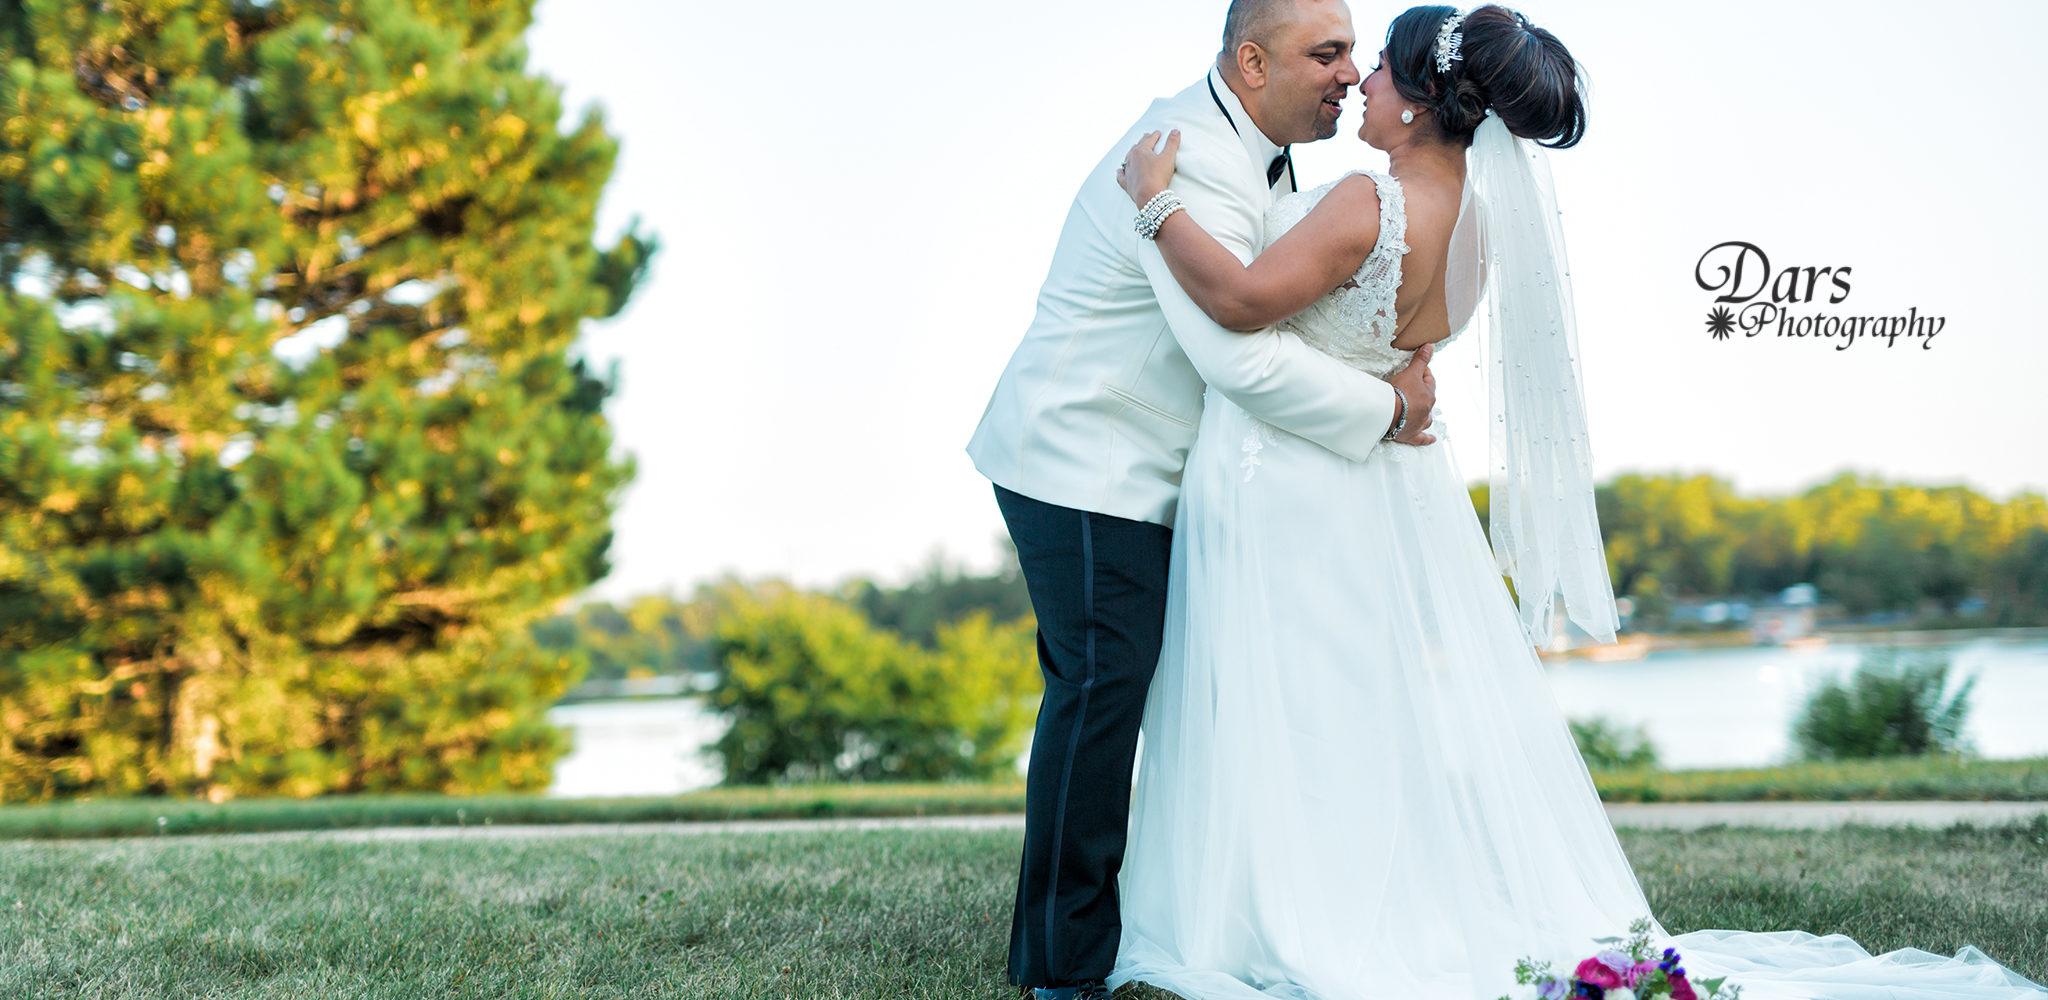 BEAUTIFUL WEDDING IN ASHIYANA DOWNERS GROVE